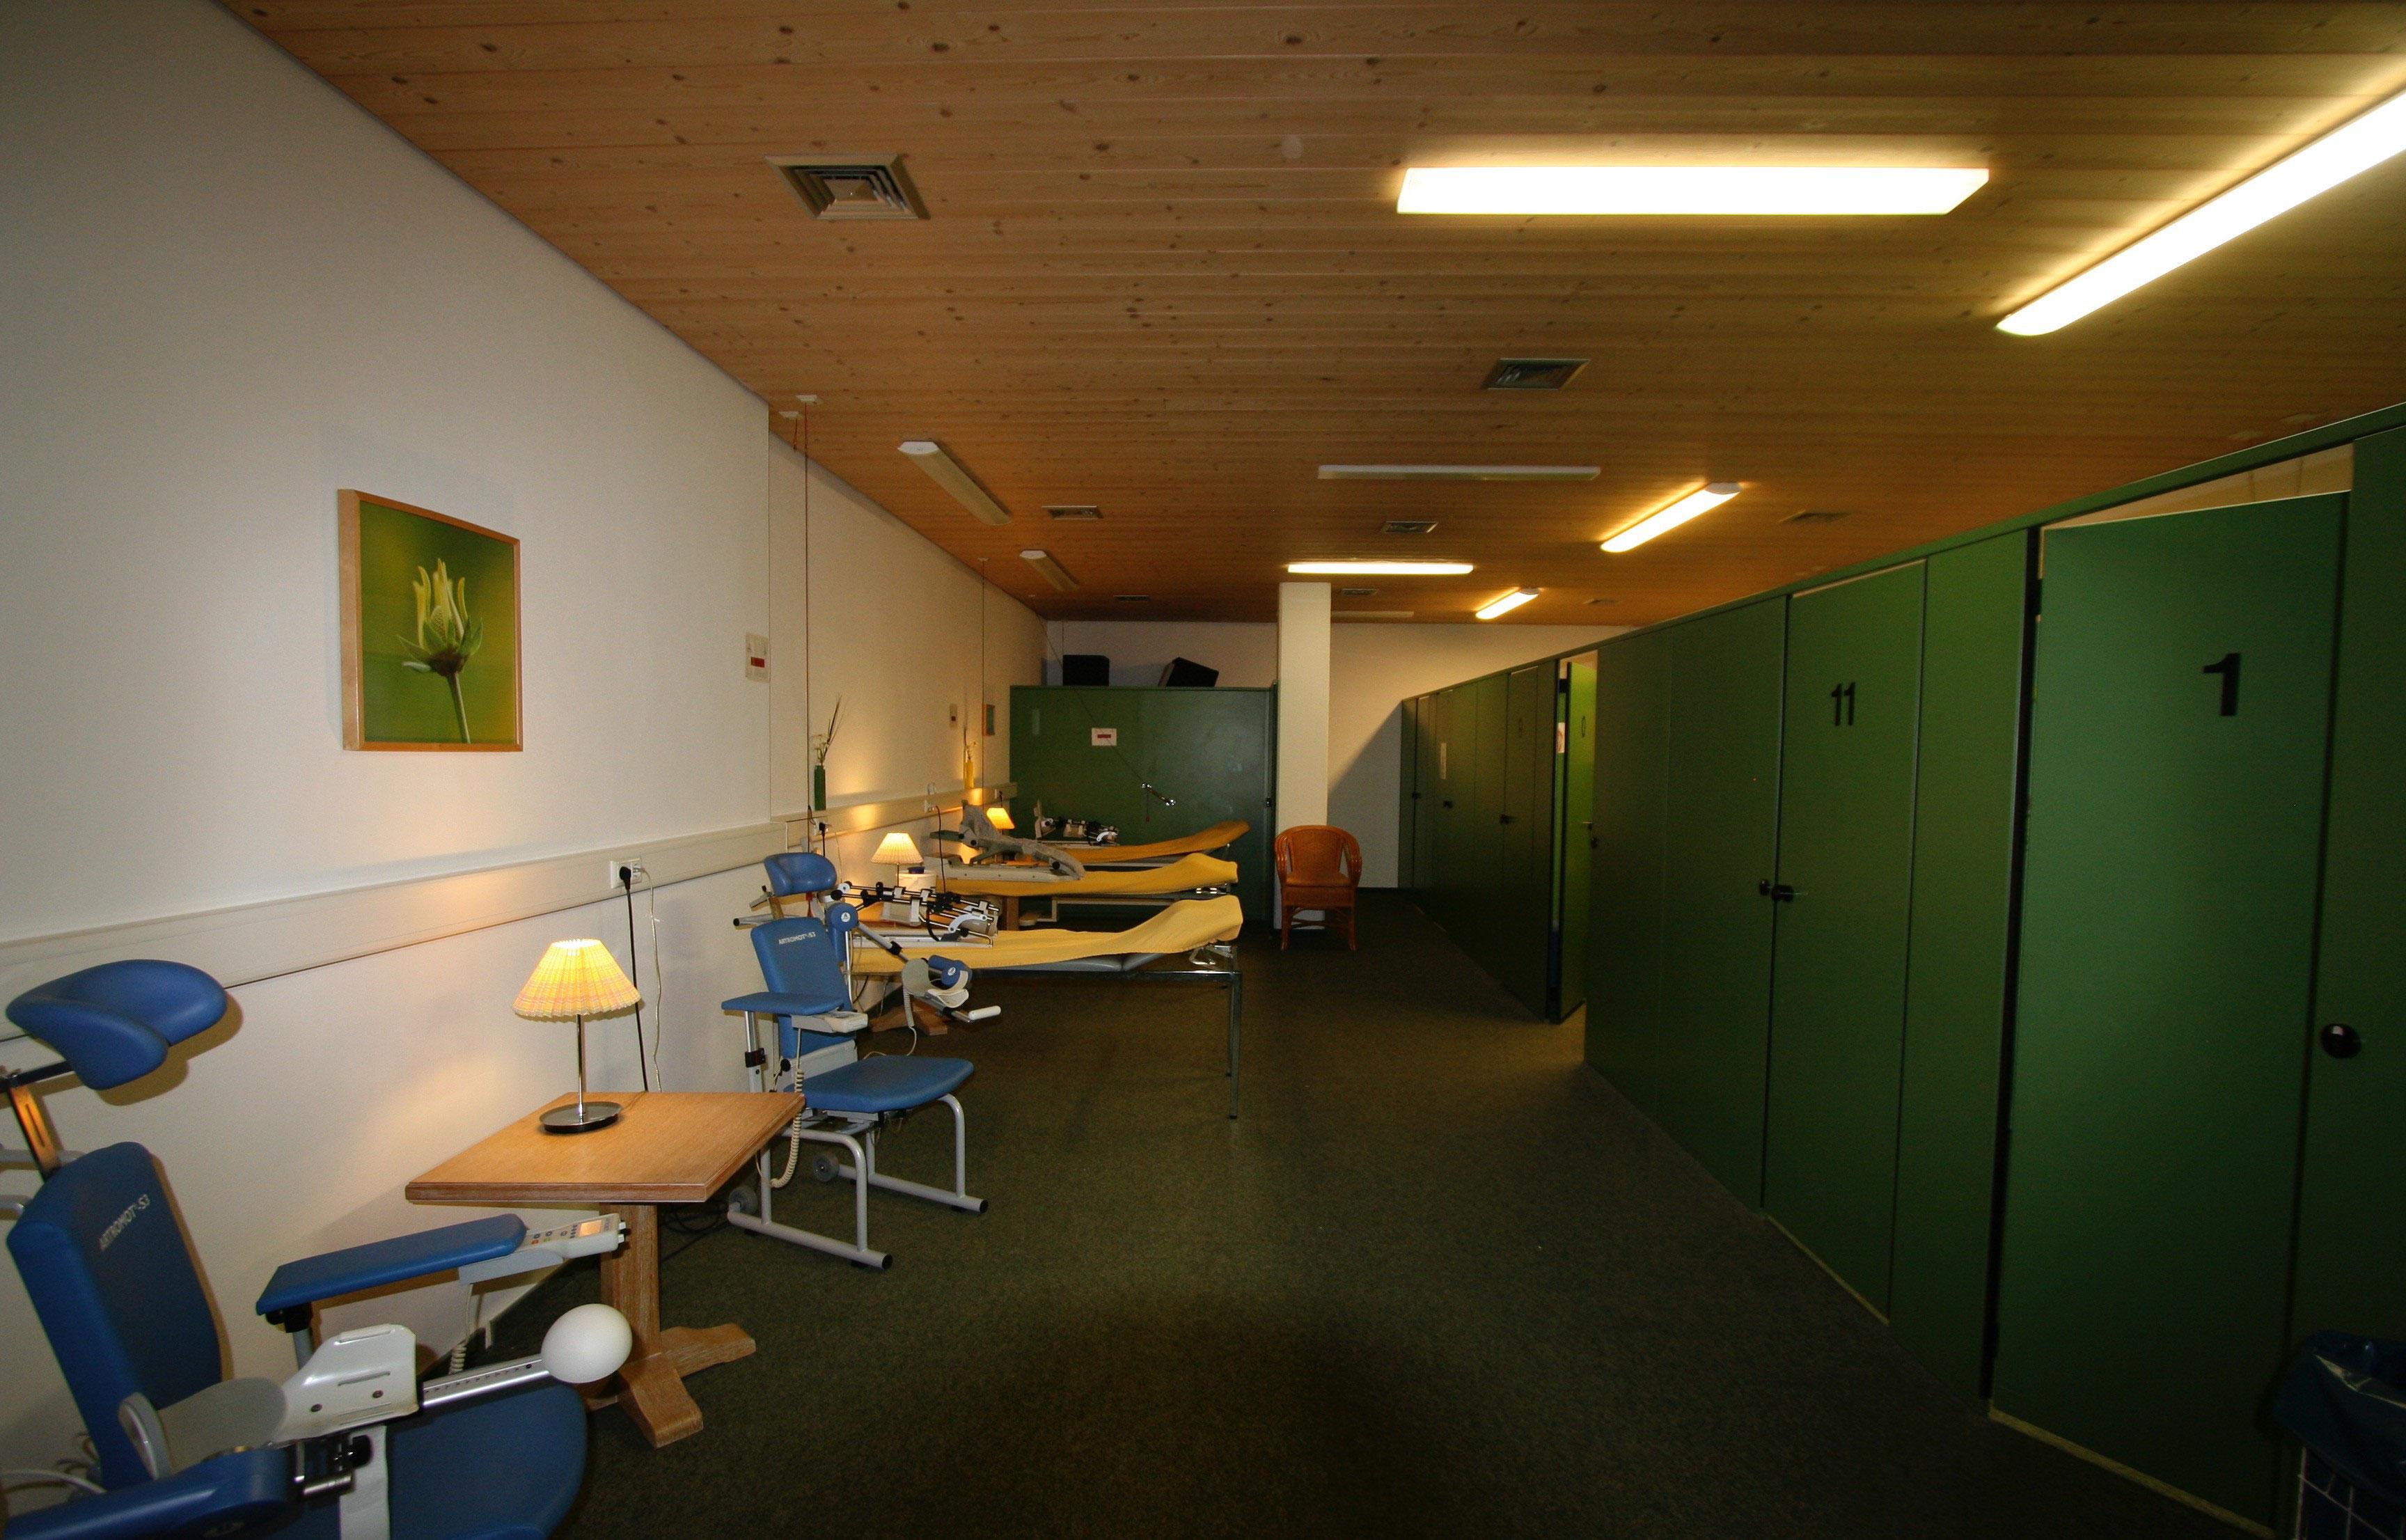 Innenarchitektur-Rehaklinik-Klinik-Vorher-1-Neu